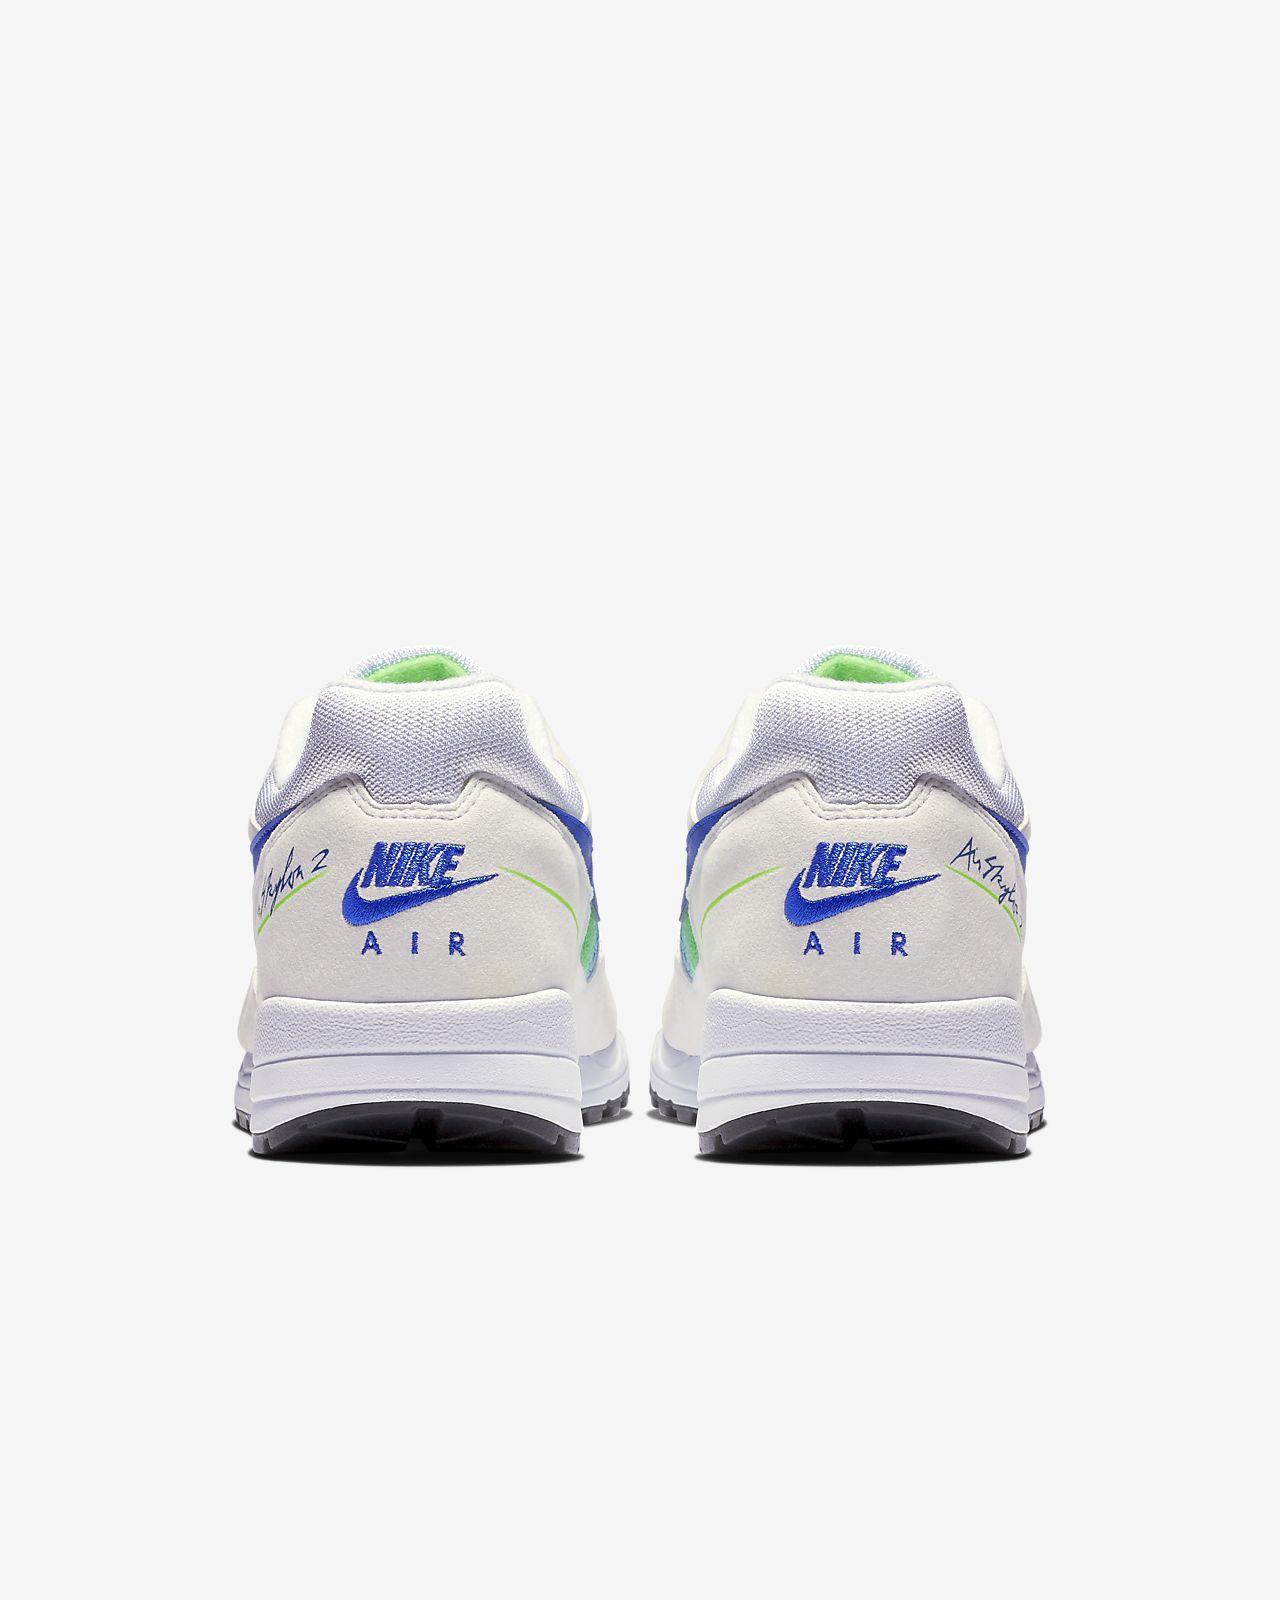 brand new beb6a db2db Low Resolution Nike Air Skylon II Men s Shoe Nike Air Skylon II Men s Shoe